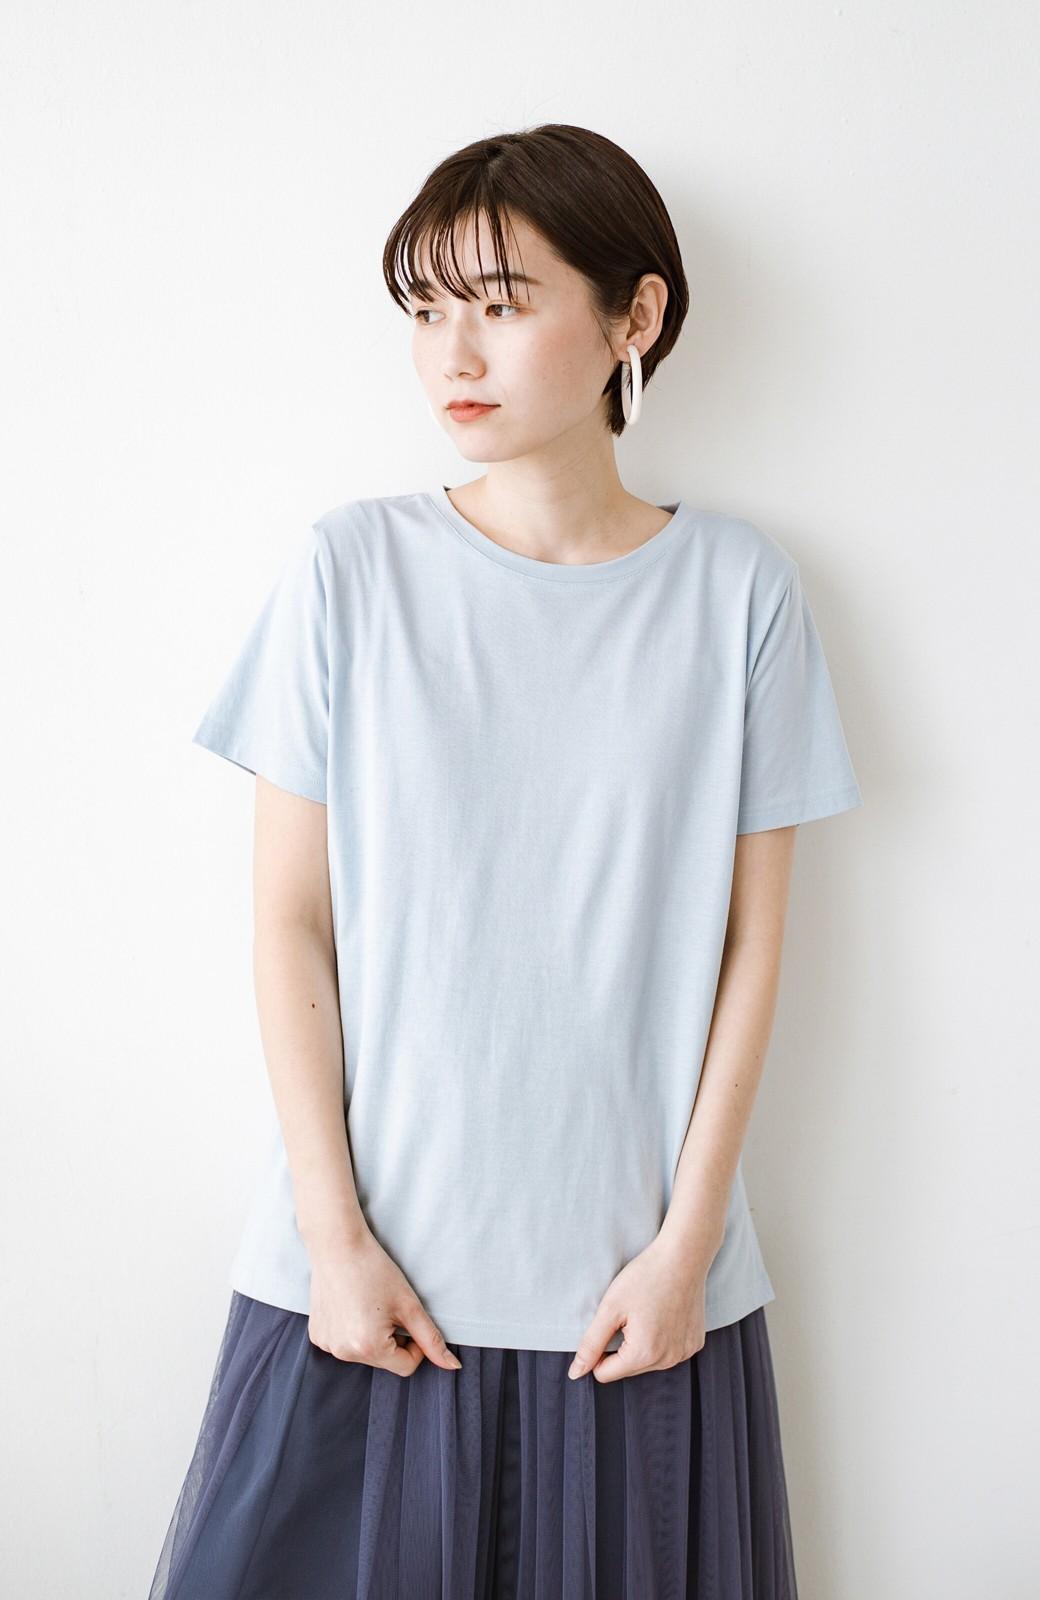 haco! 汗染み軽減加工で安心!1枚でも重ね着にも便利なシンプルTシャツ by ZAMPA <サックスブルー>の商品写真1